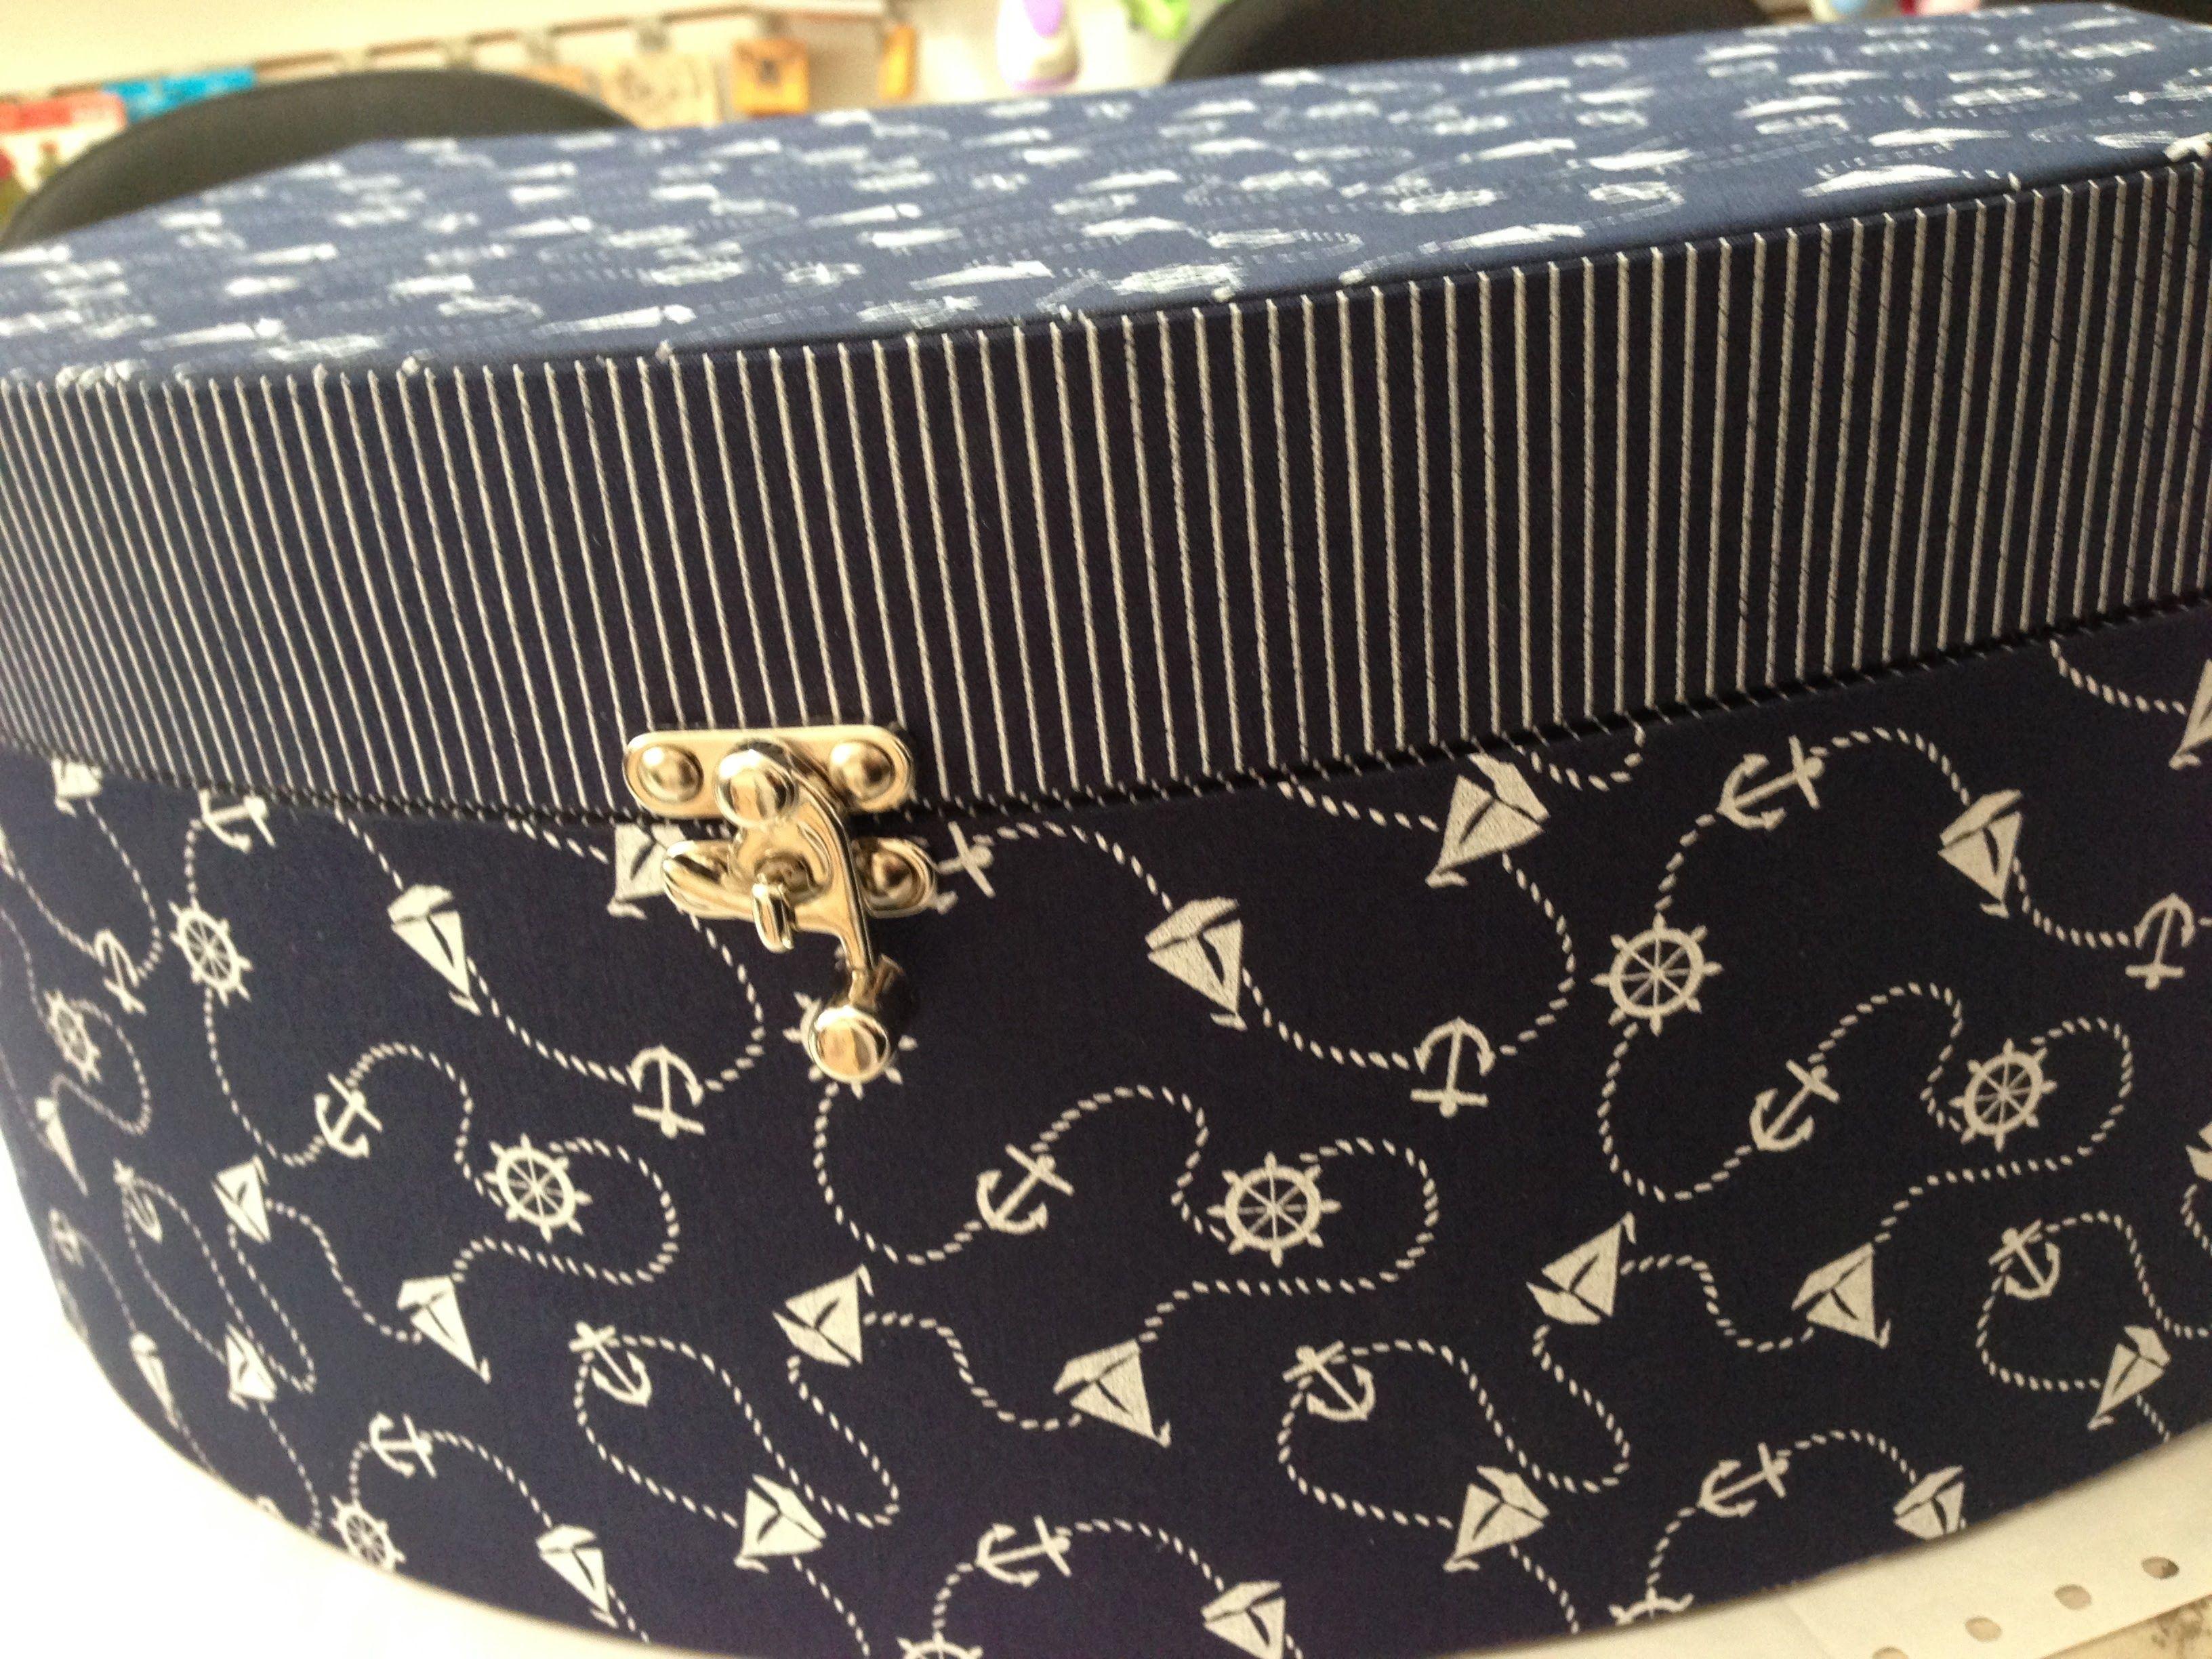 maleta azul marinho grande Kátia Cumer